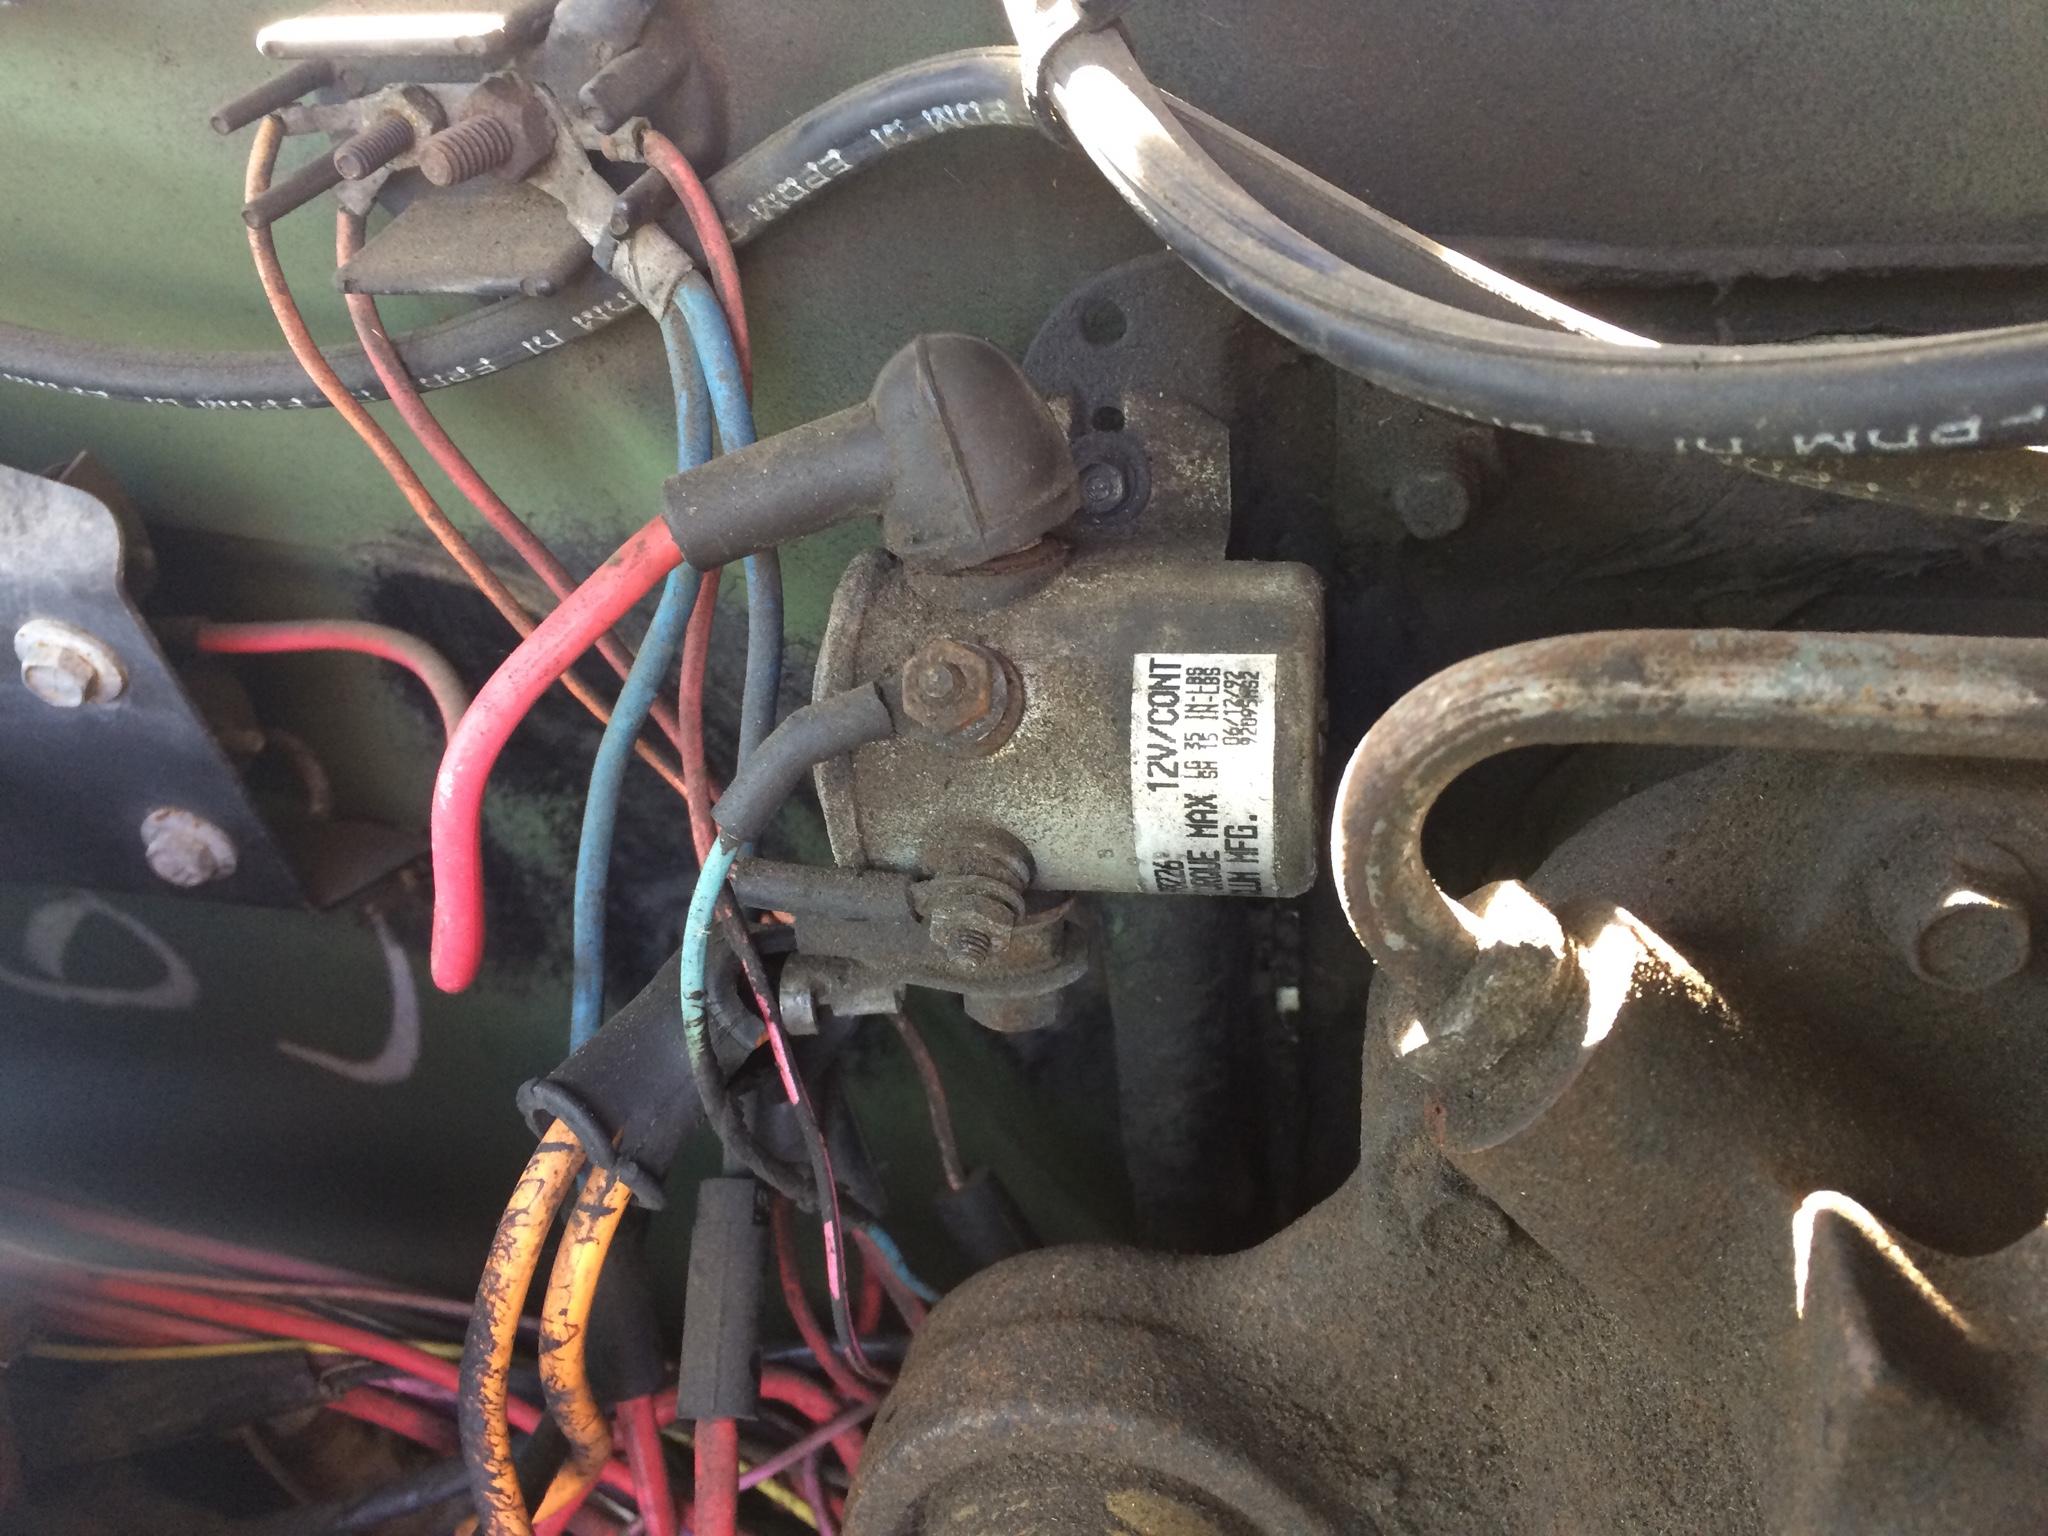 86 chevy truck radio wiring diagram trailer brake controller k10 stereo 89 light